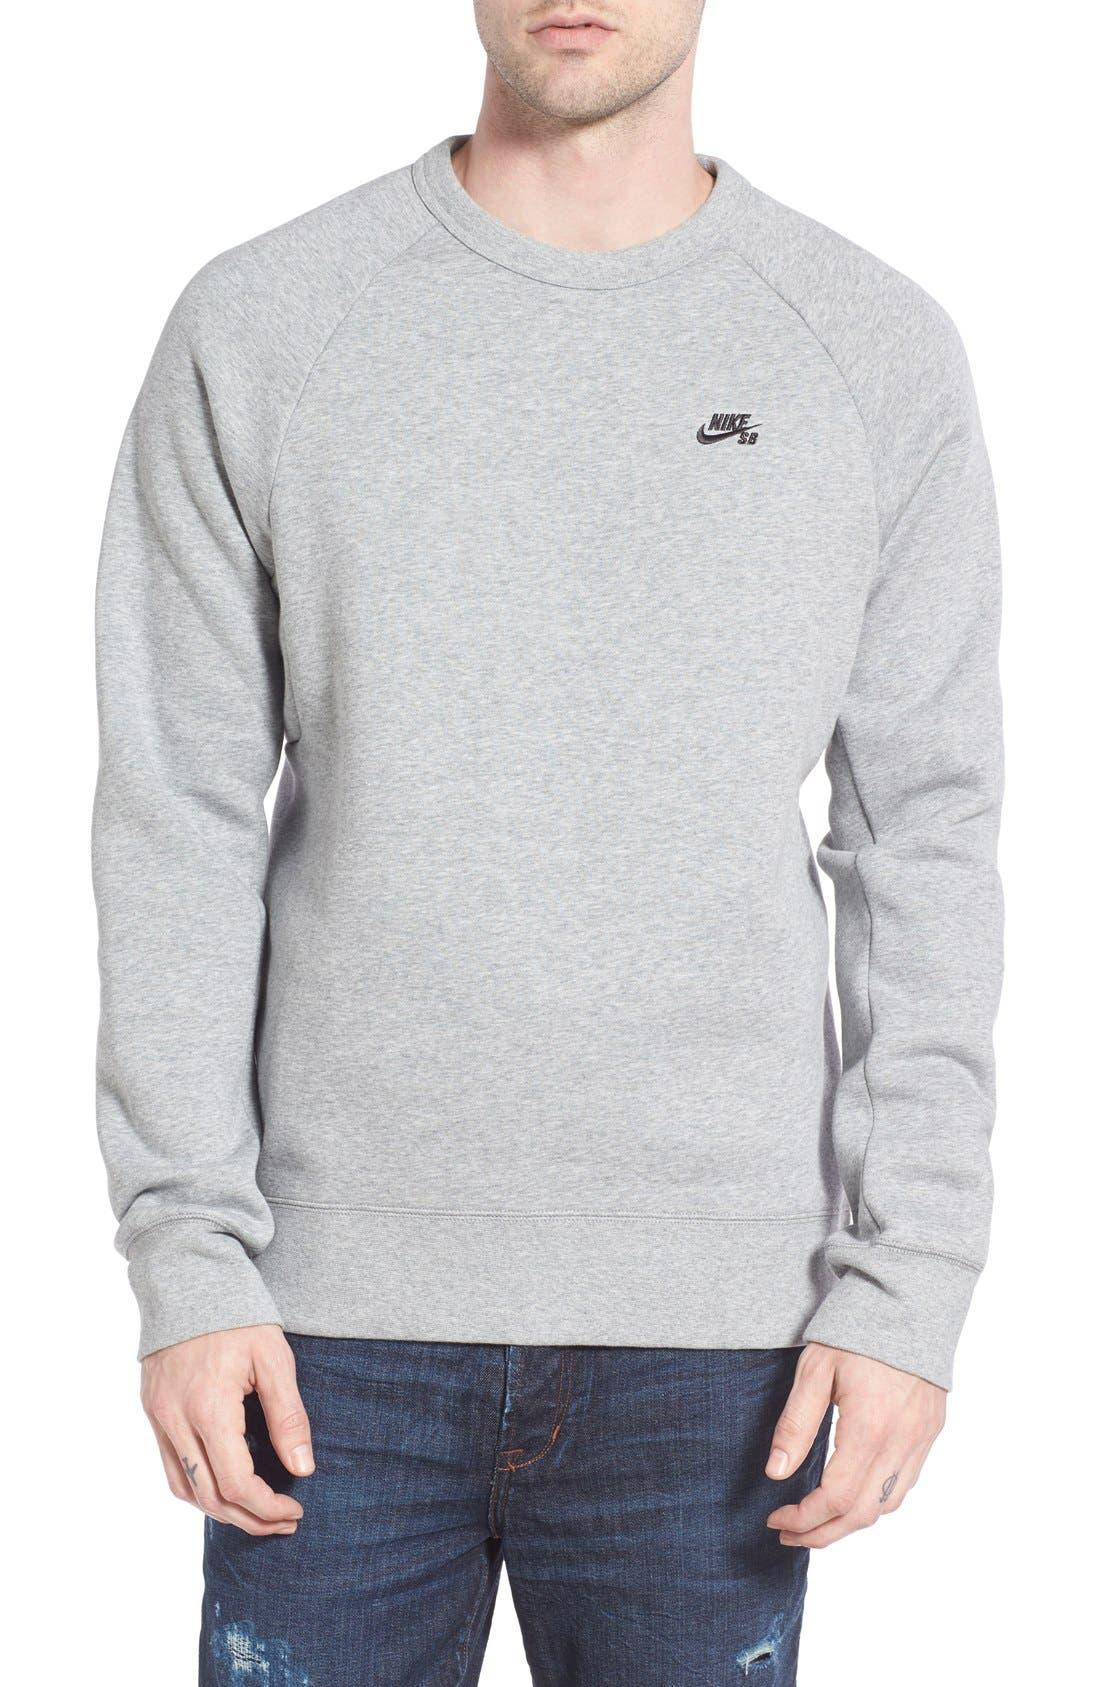 Main Image - Nike SB 'Icon' Raglan Sweatshirt